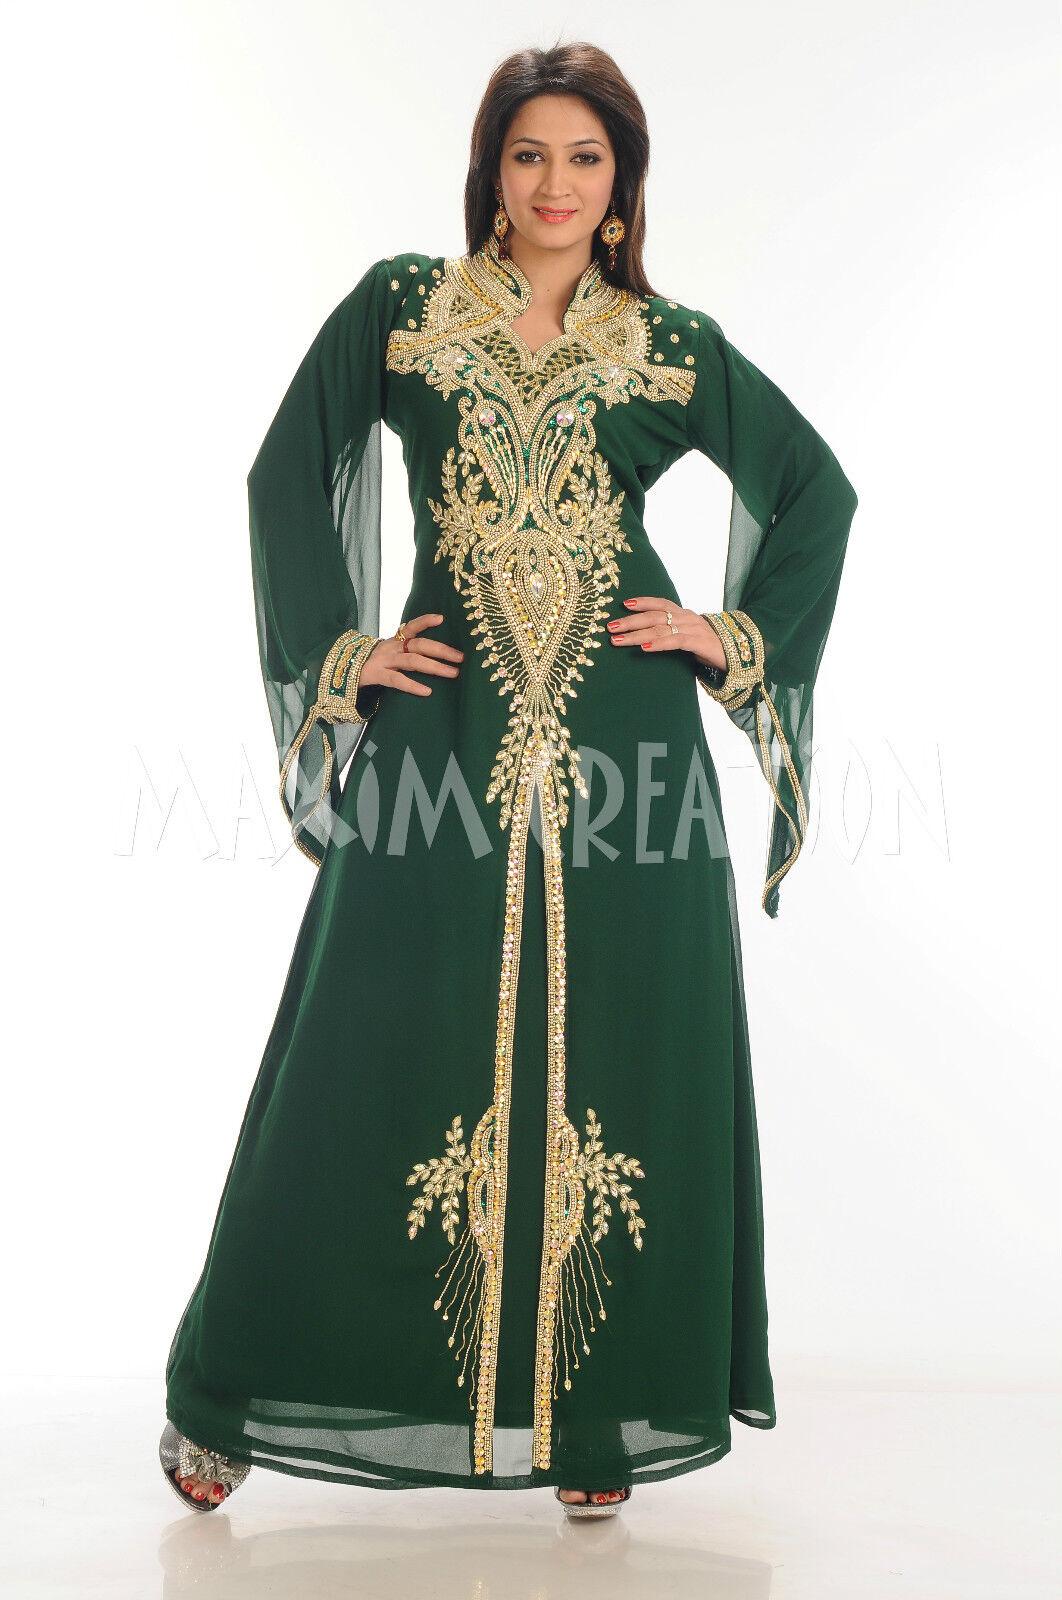 NEW DUBAI MgoldCCAN BEAUTIFUL ISLAMIC ARABIAN WEDDING GOWN GOWN GOWN PARTY WEAR DRESS 3401 8a17c4